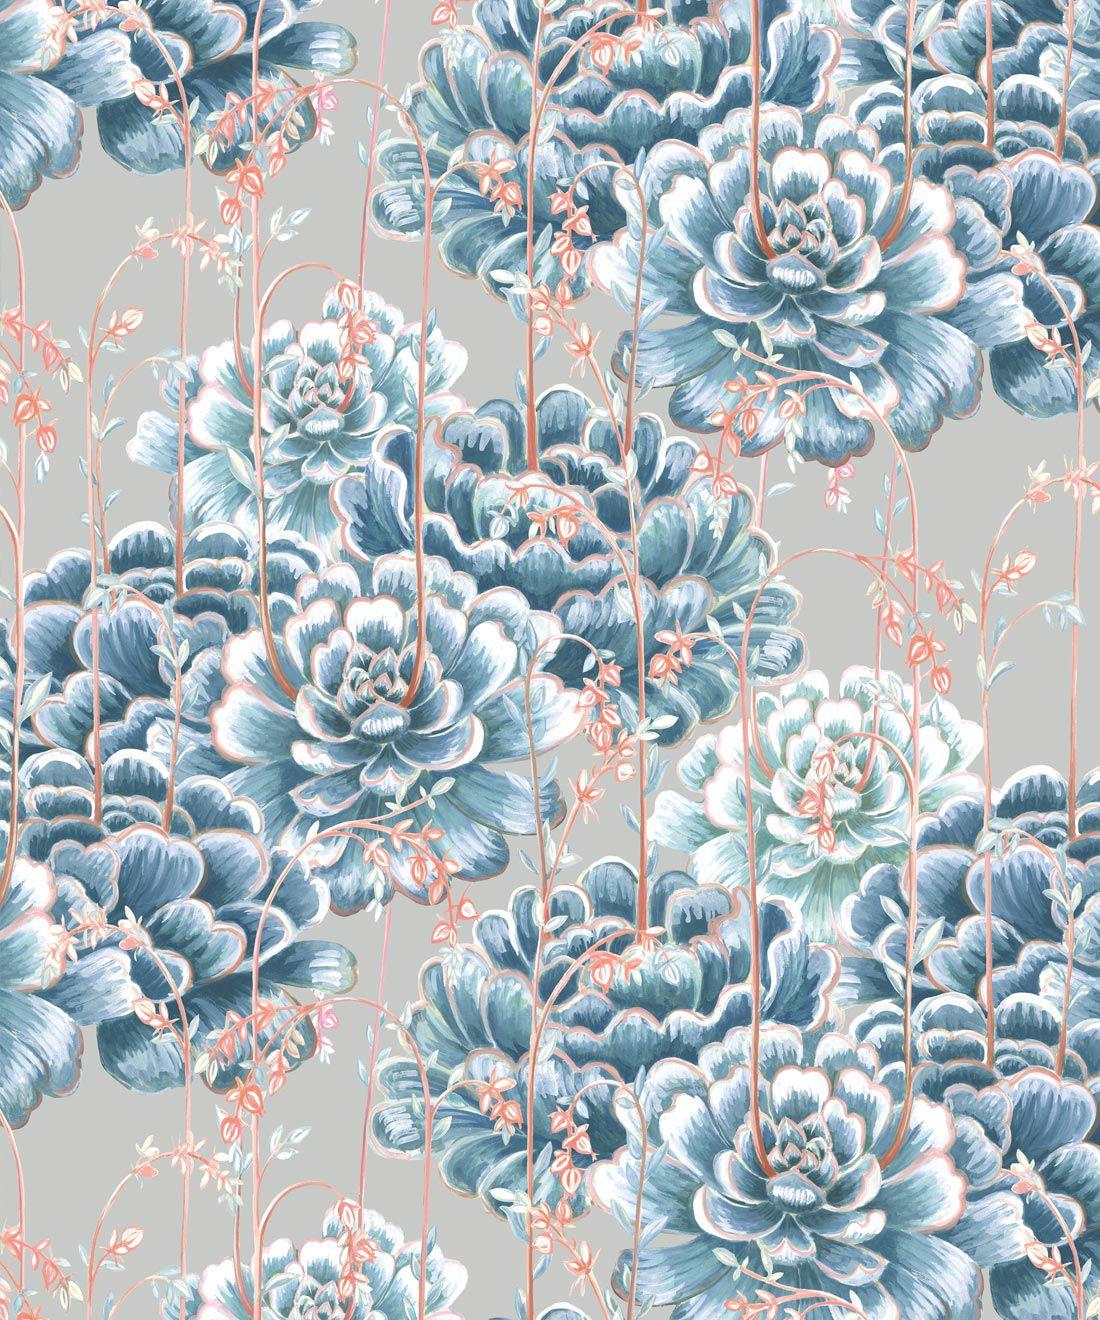 Succulents Wallpaper Steel Blue • Cactus Wallpaper • Desert Wallpaper Swatch on grey background